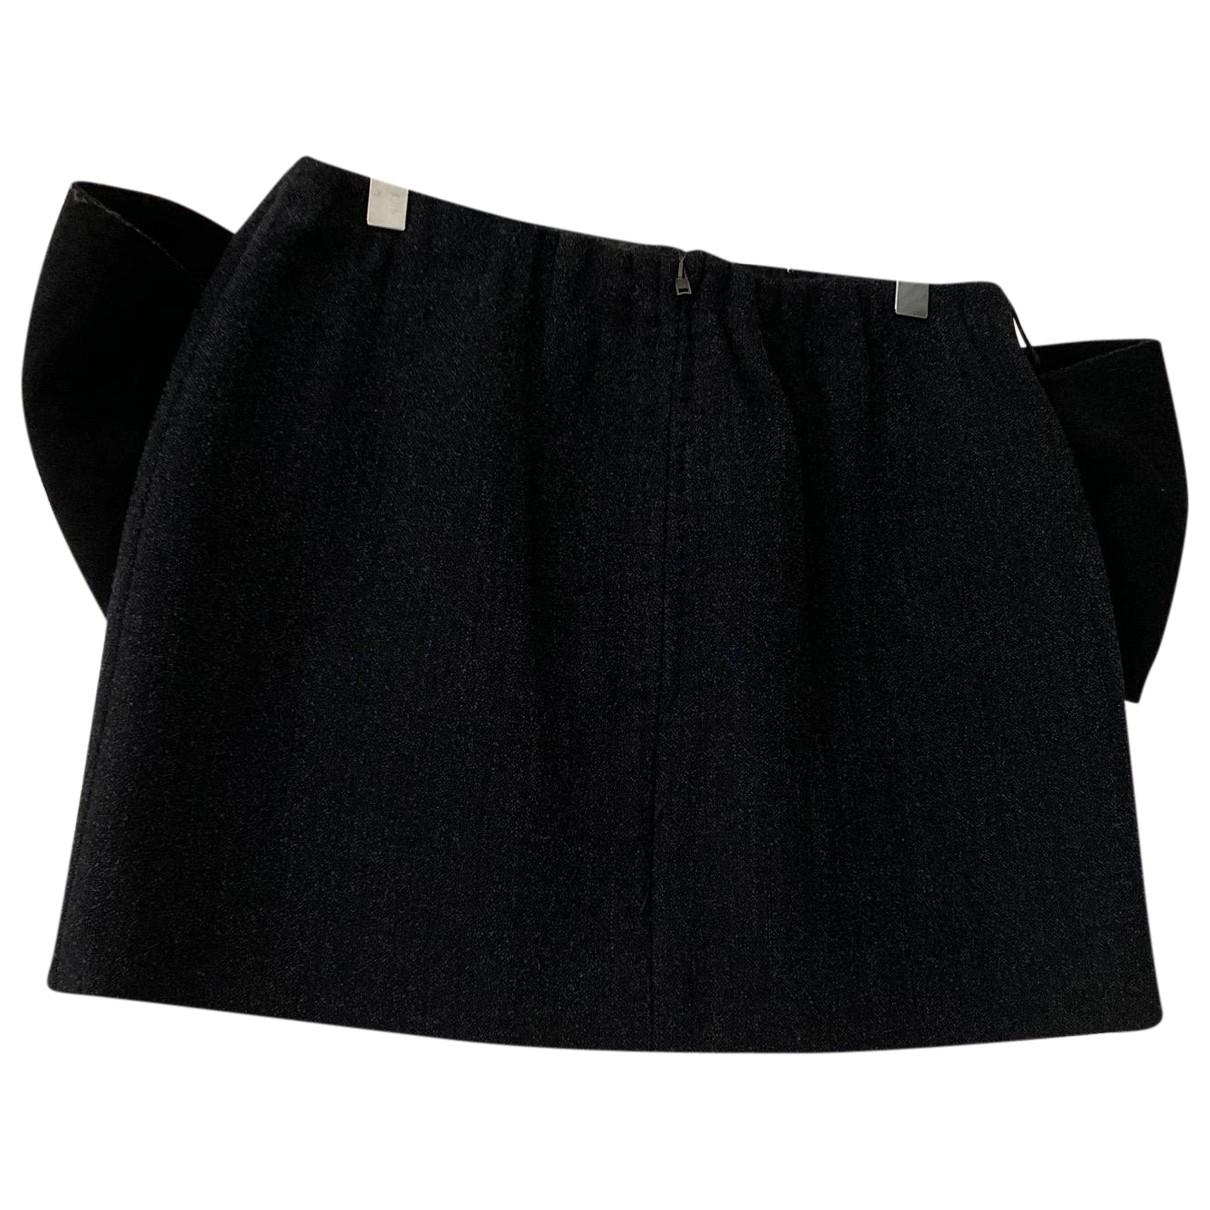 Miu Miu \N Grey Wool skirt for Women 38 IT